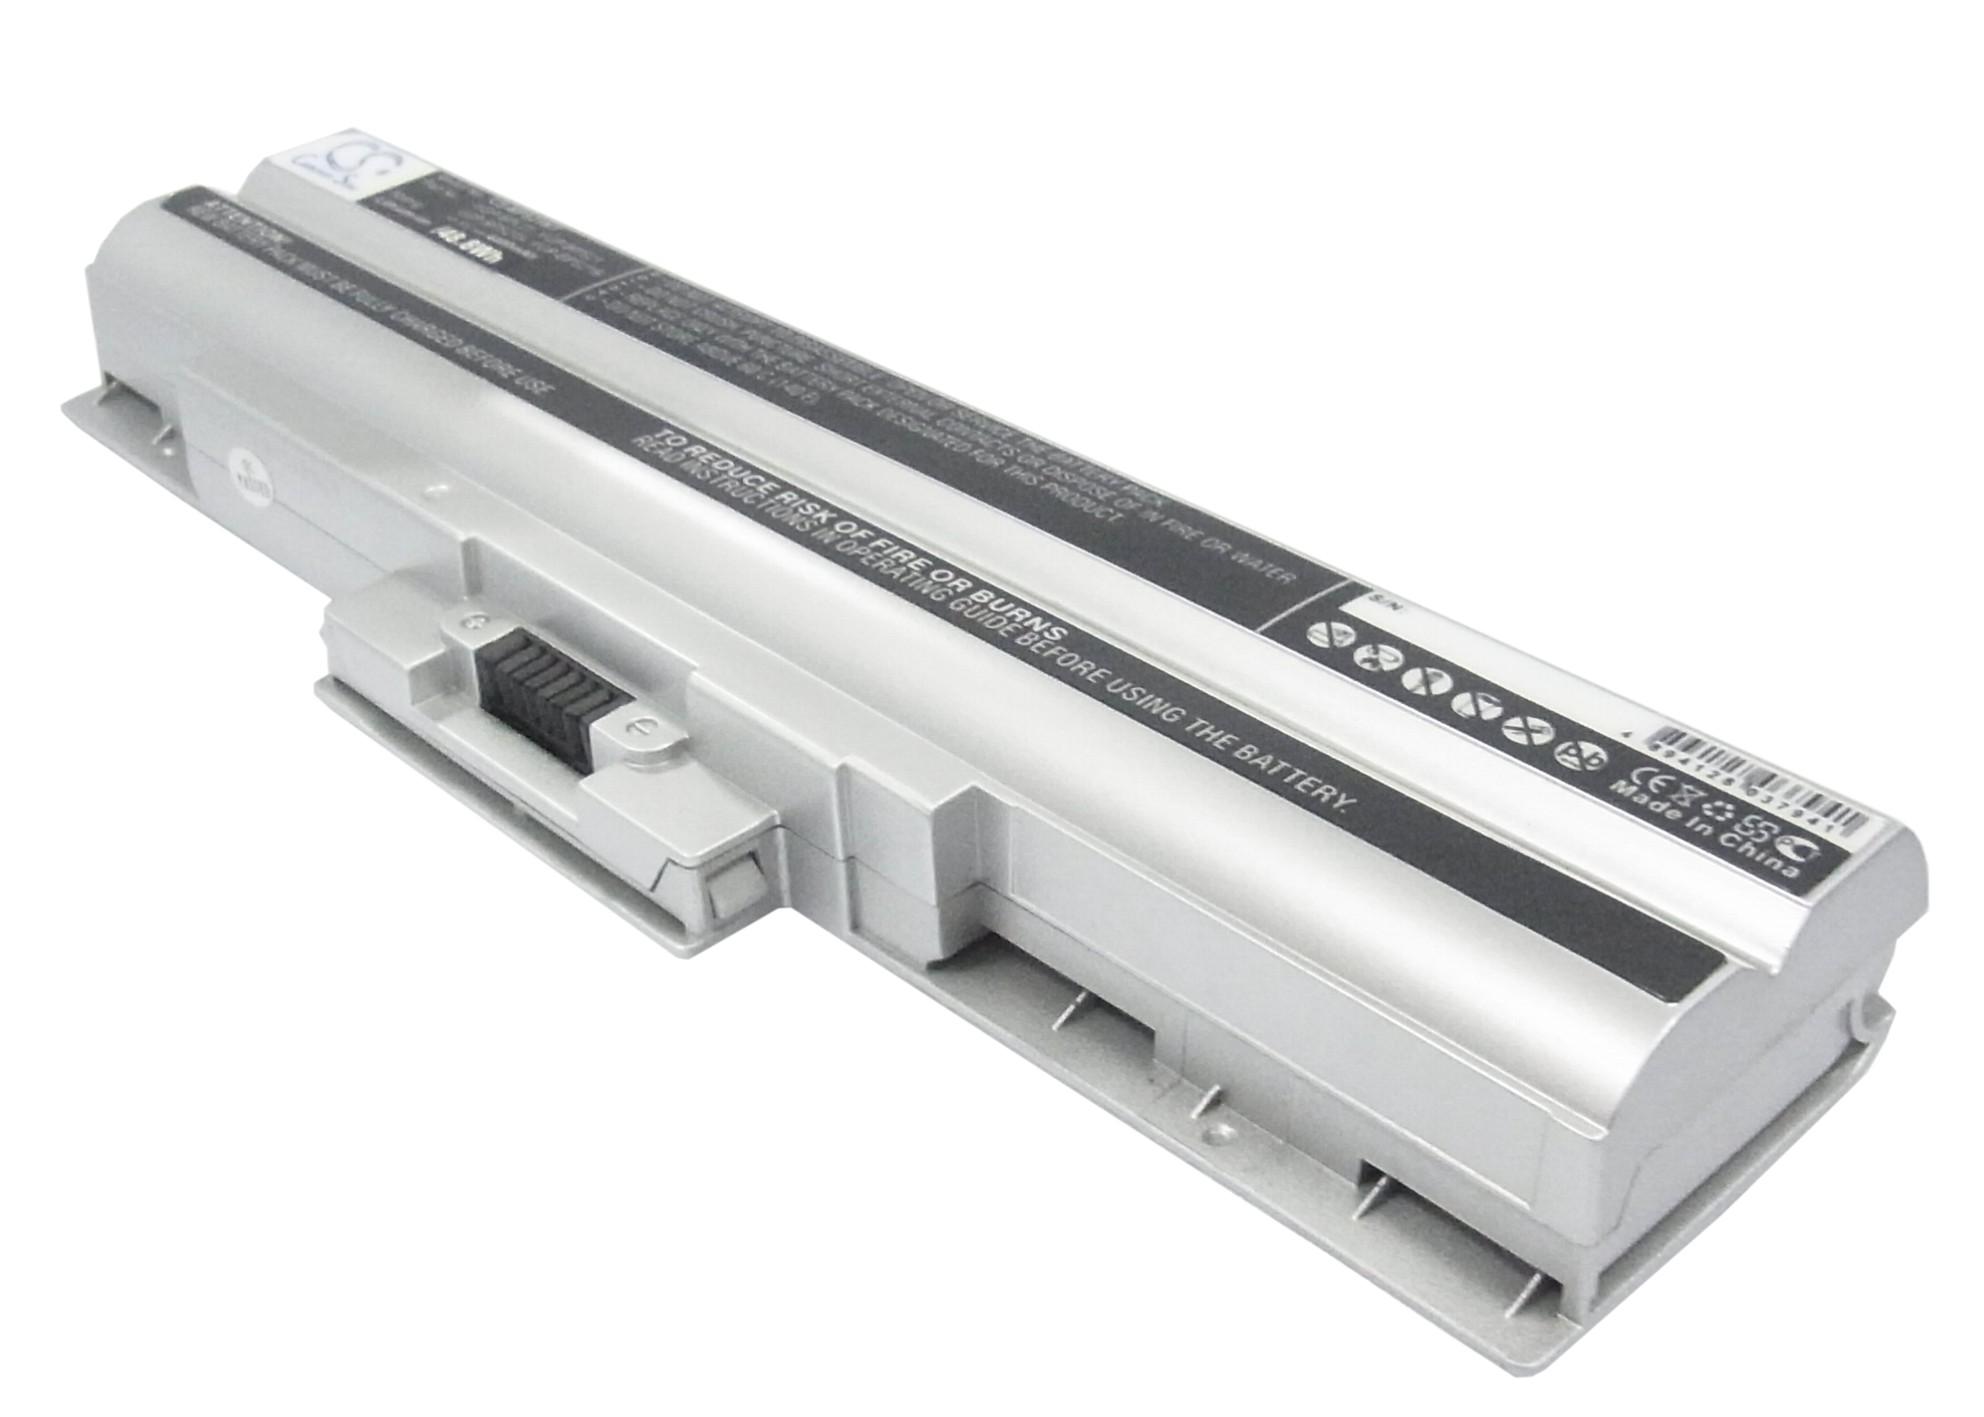 Cameron Sino baterie do notebooků pro SONY VAIO VGN-CS36GJ/Q 11.1V Li-ion 4400mAh stříbrná - neoriginální